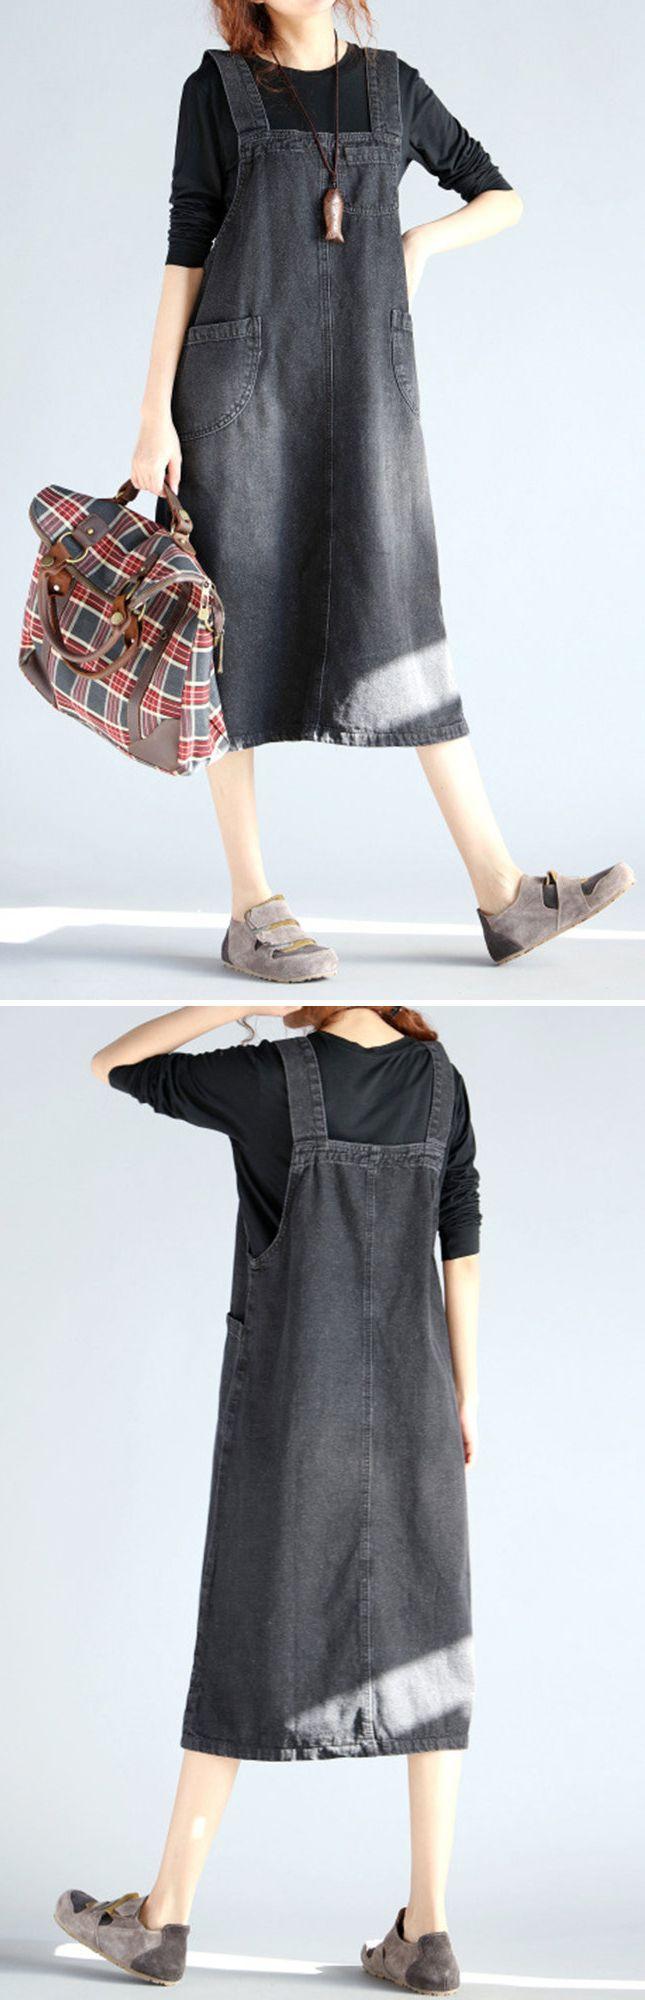 US$ 22.56 O-NEWE Casual Sleeveless Pockets Strap Denim Dress For Women